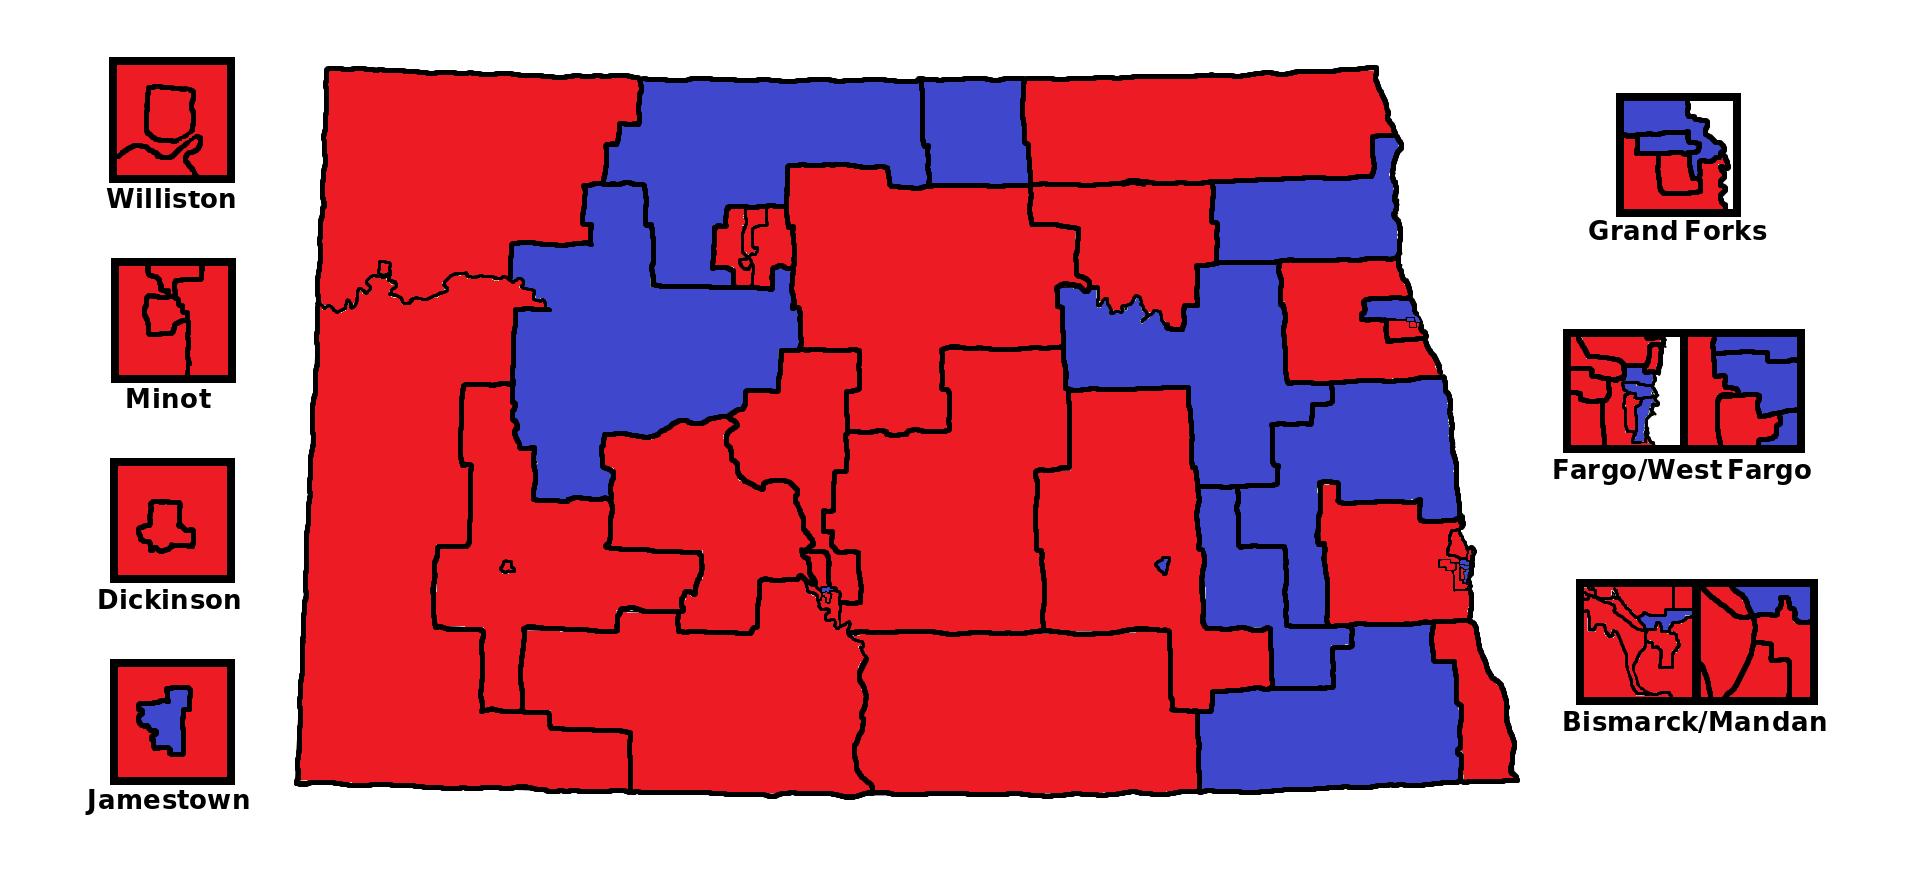 FileNorth Dakota State Senate Partisan Mappng Wikimedia Commons - North dakota state map